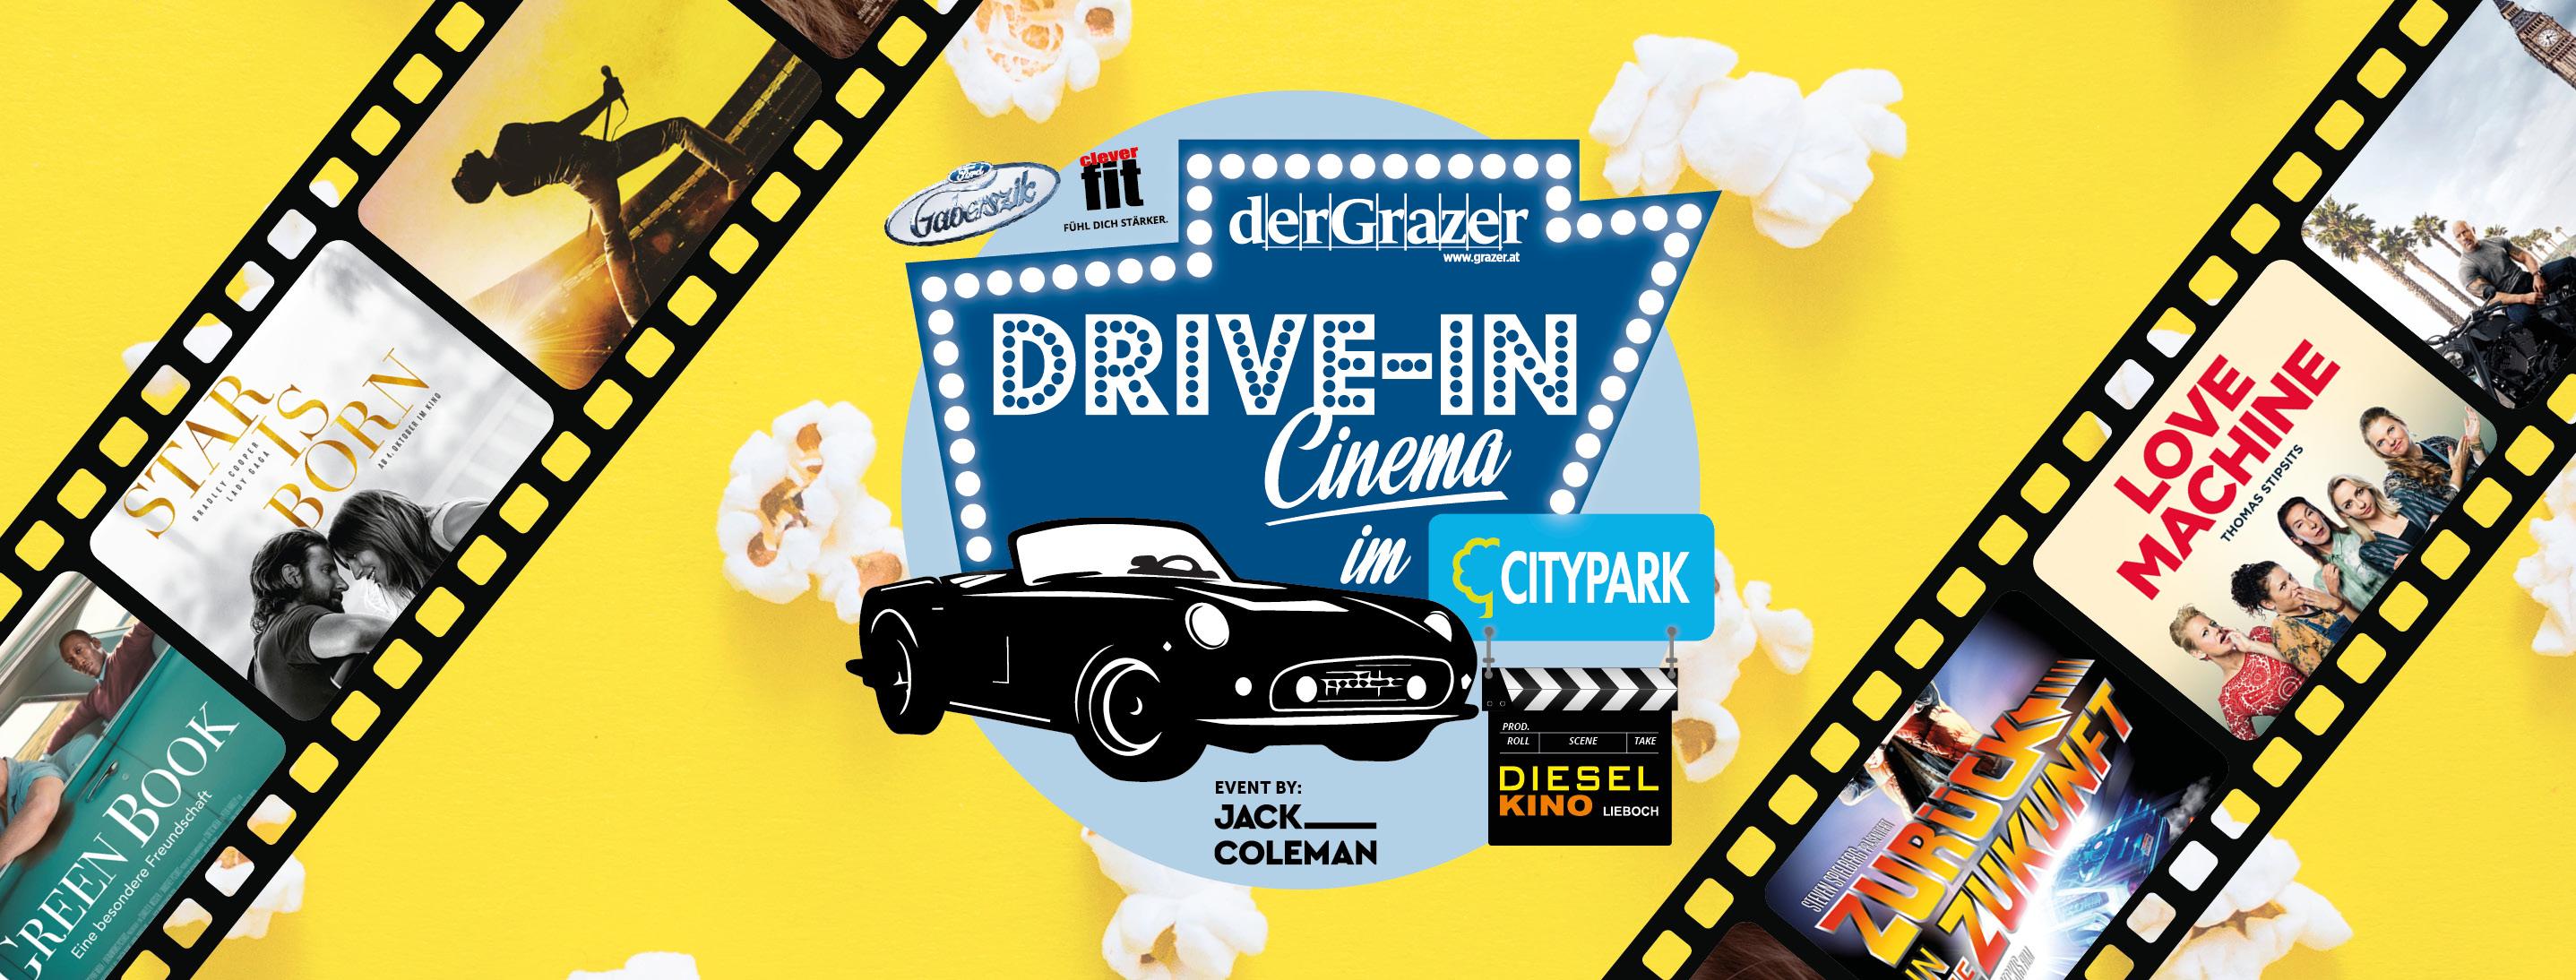 Drive-In-Cinema-Autokino-Graz-Jack-Coleman-Citypark-Grazer-Movies-Ford-Gaberzsik 2